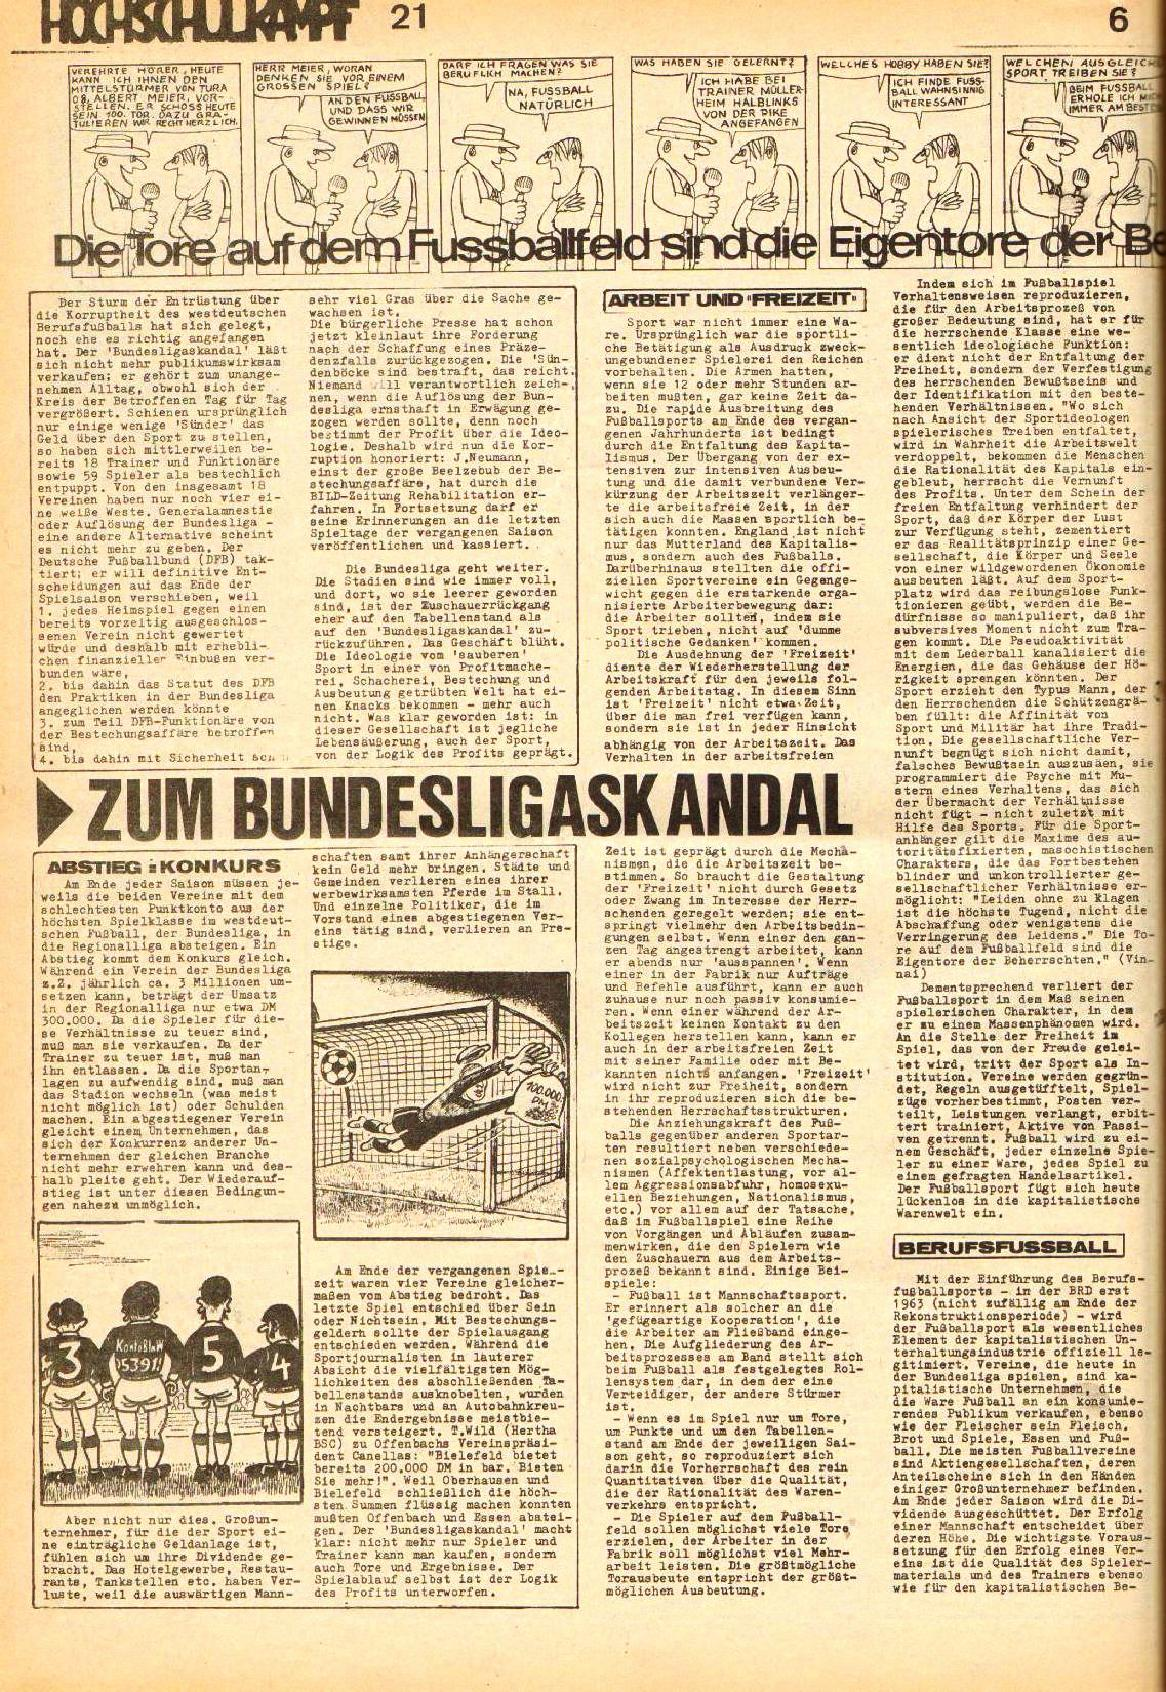 Berlin_Hochschulkampf_1971_21_08